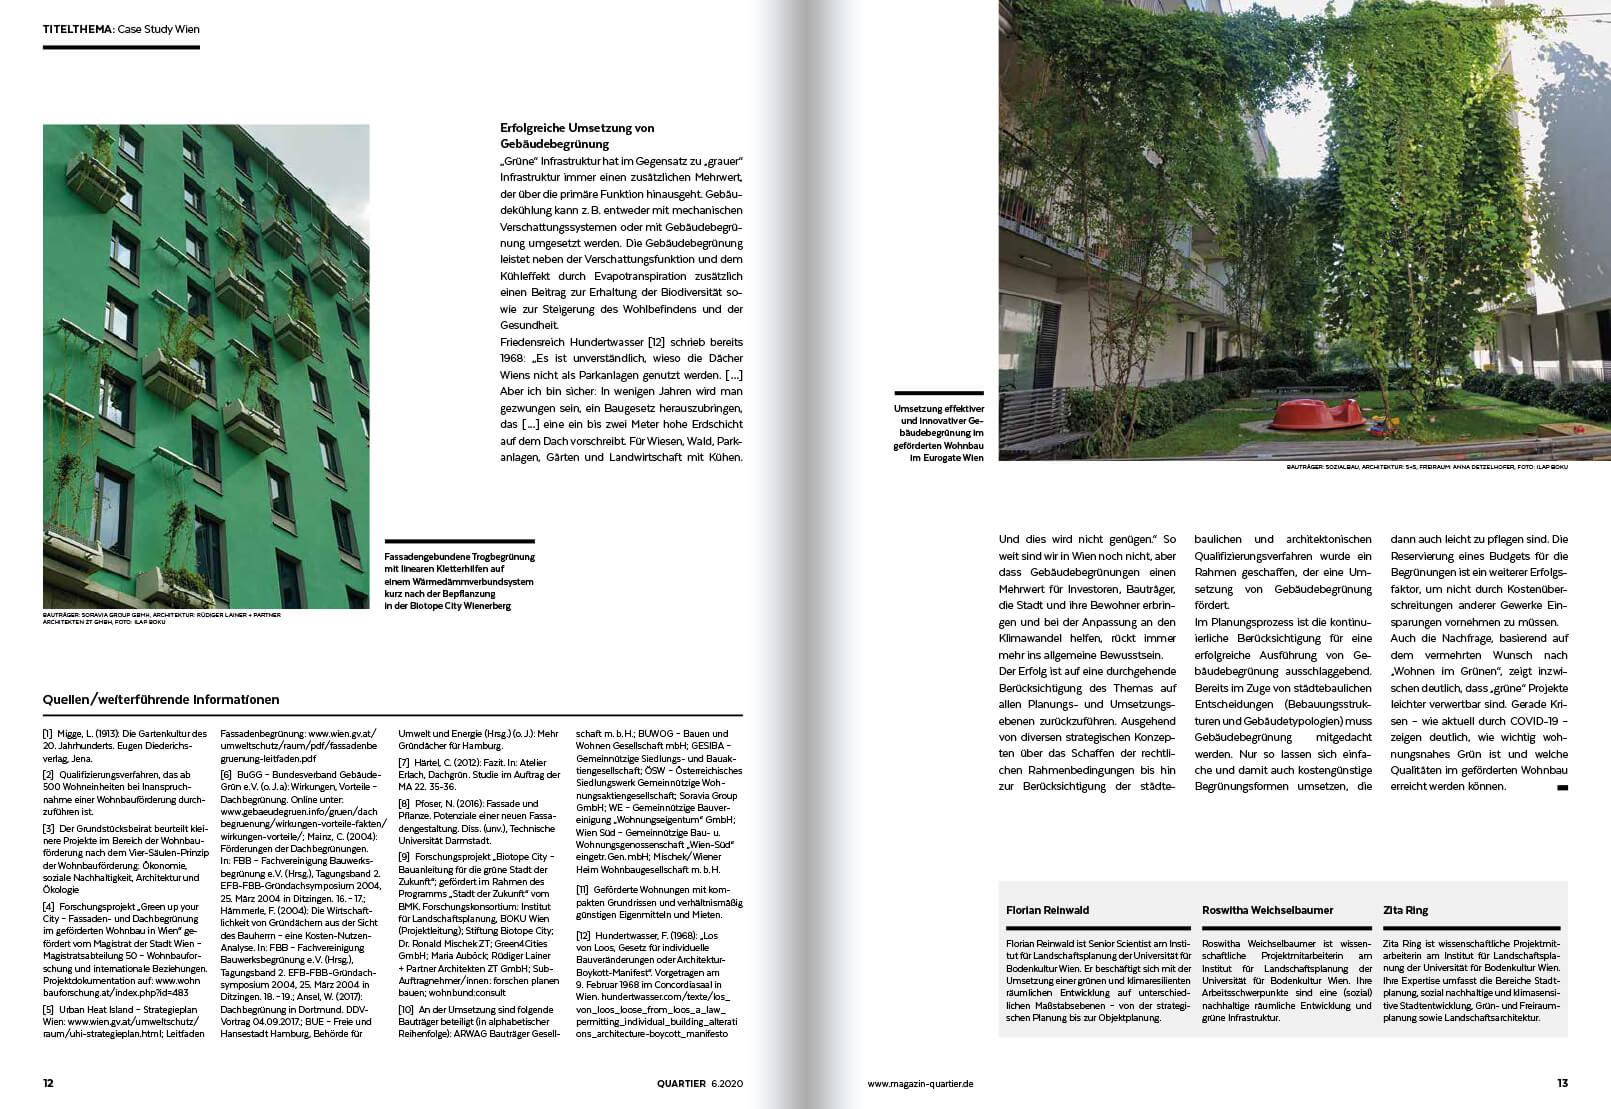 2021-01 Gebäudebegrünung 4